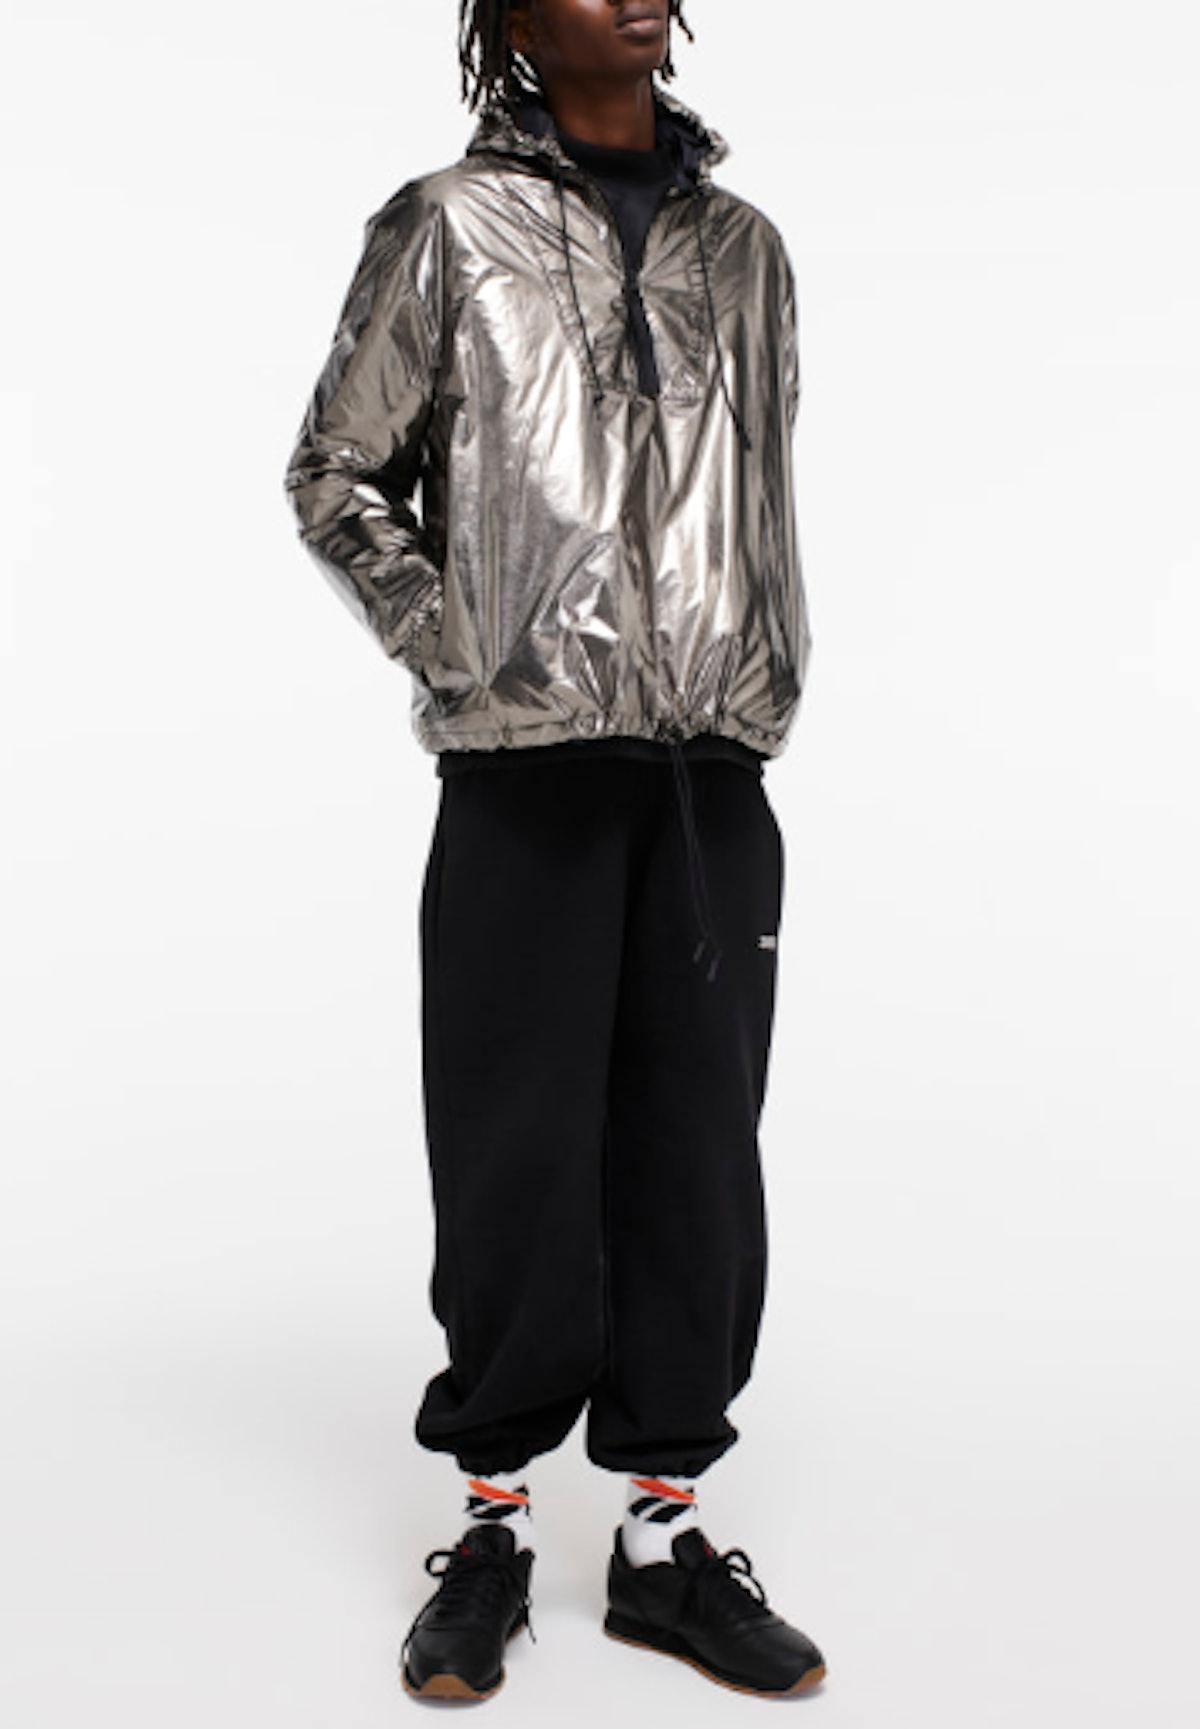 Reebok Victoria Beckham Foil Jacket